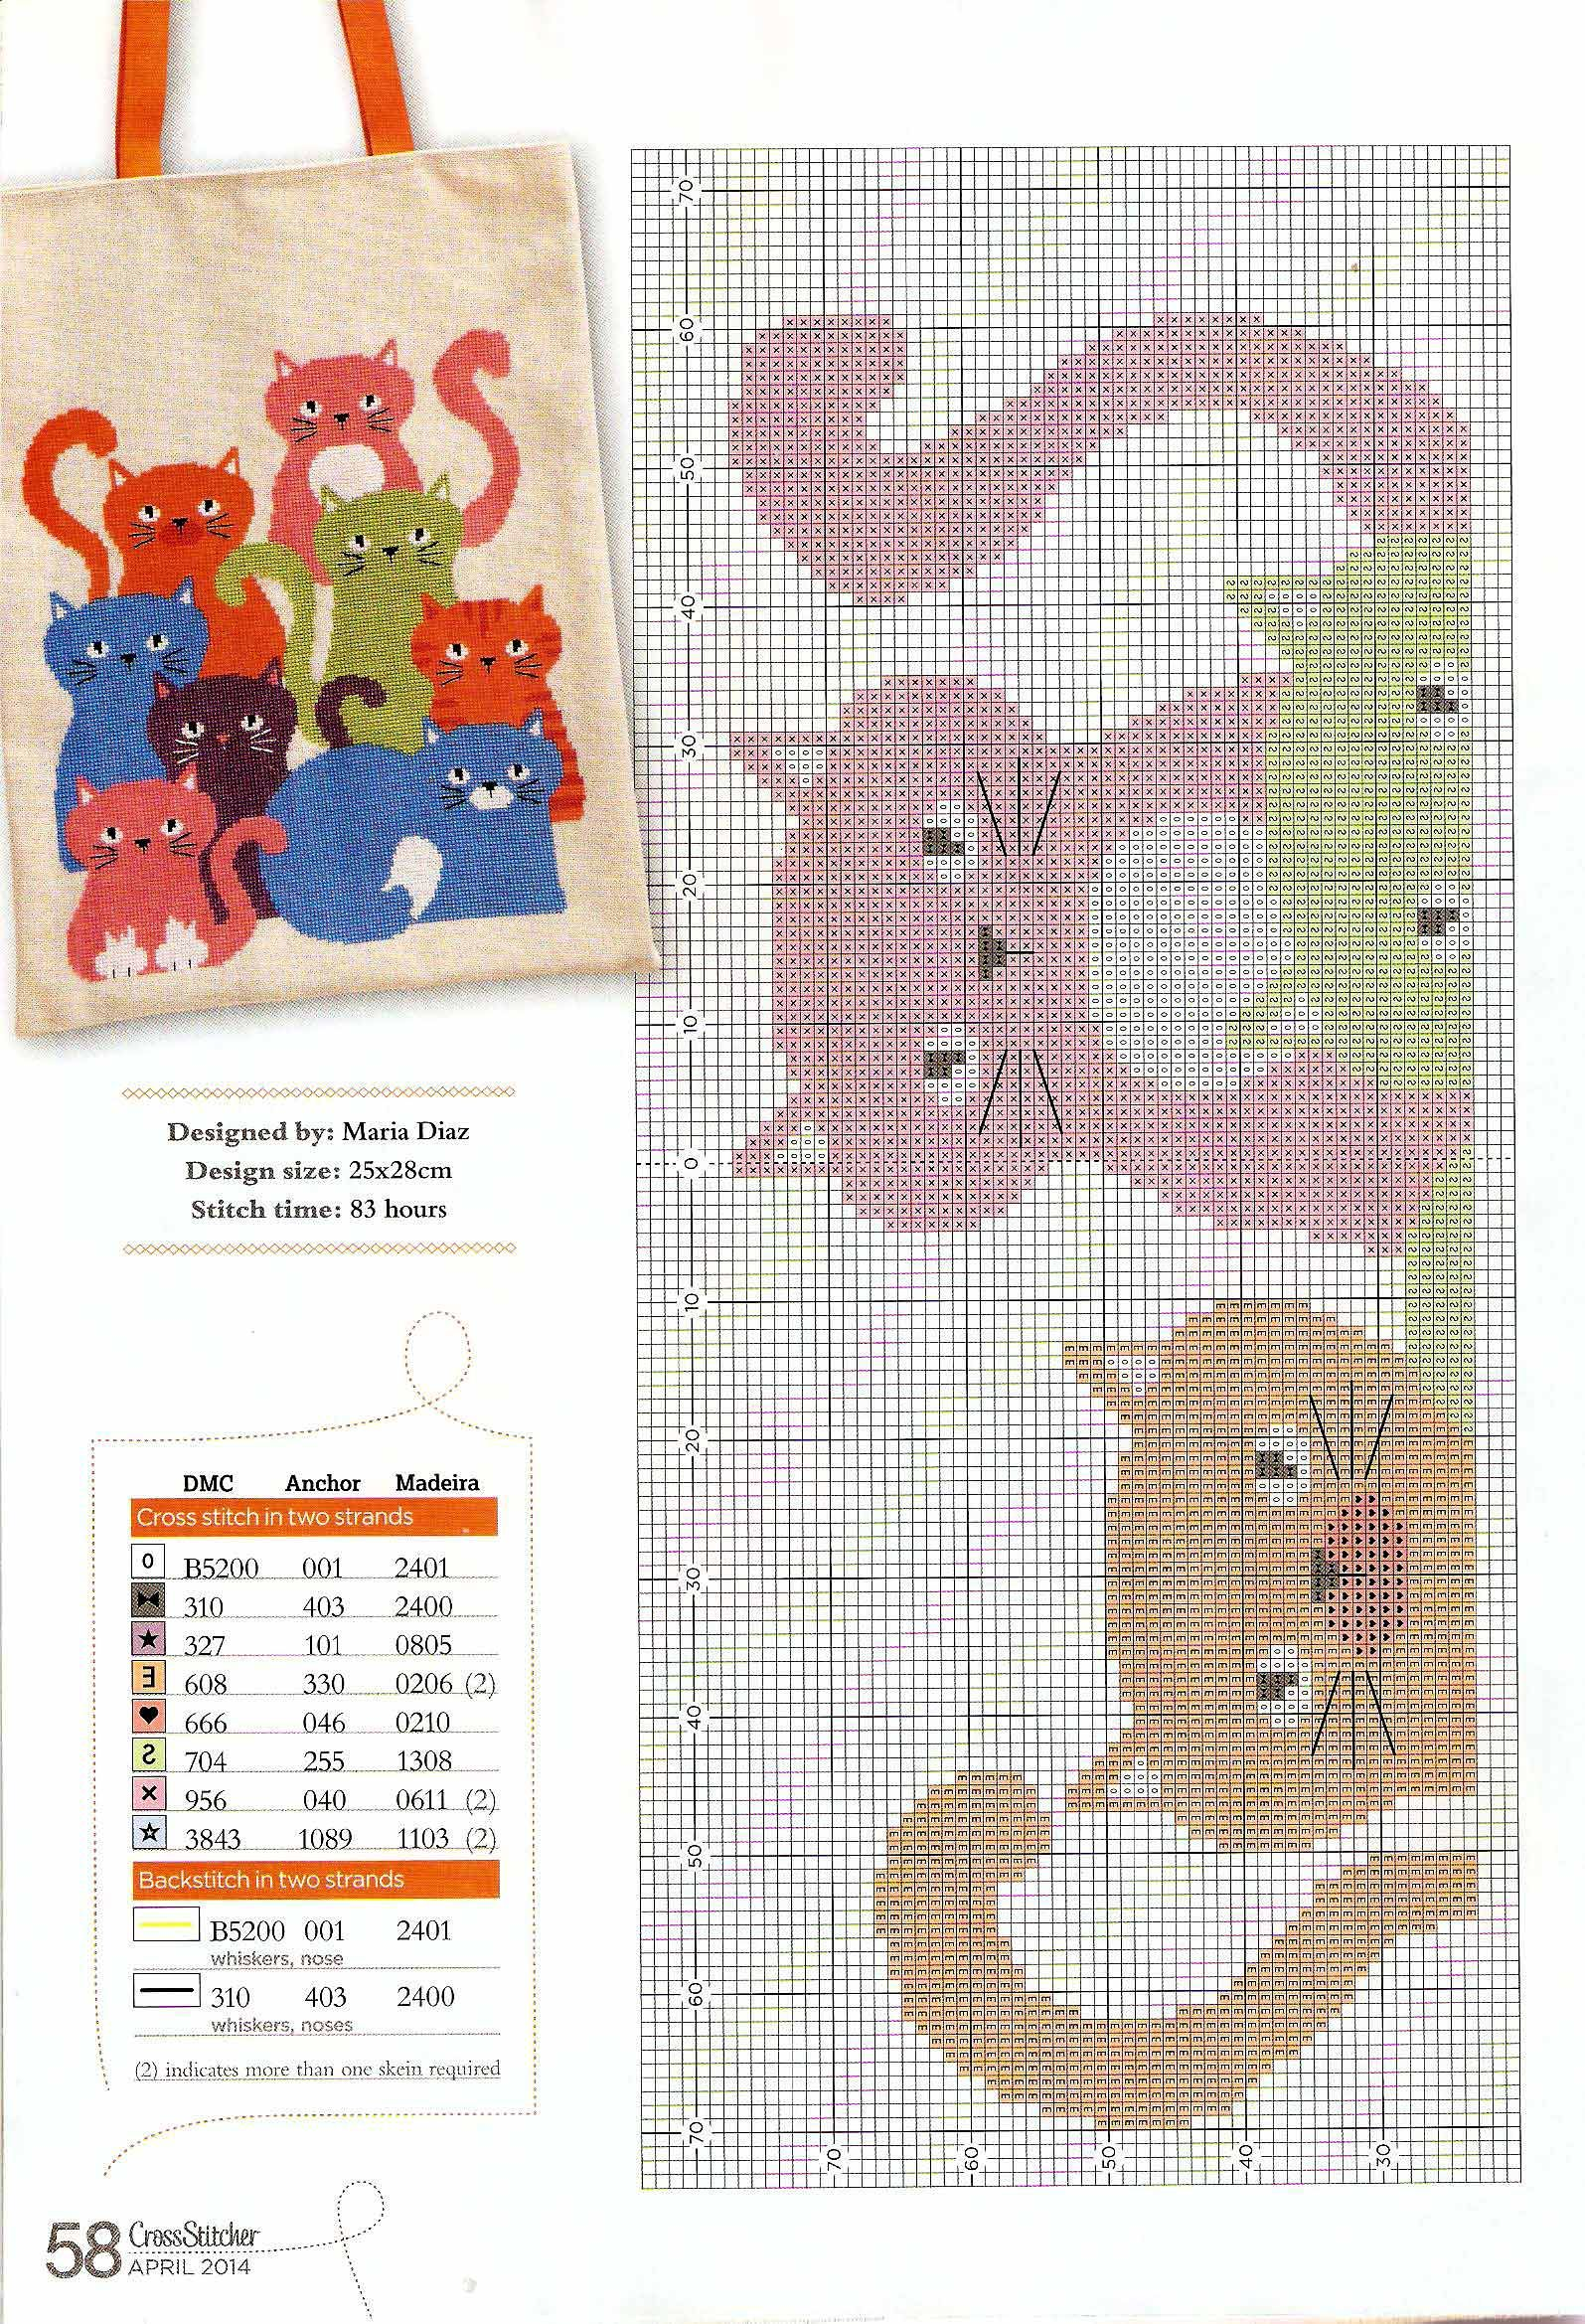 Cool cats 2 | punto cruz animales | Pinterest | Gato, Punto de cruz ...